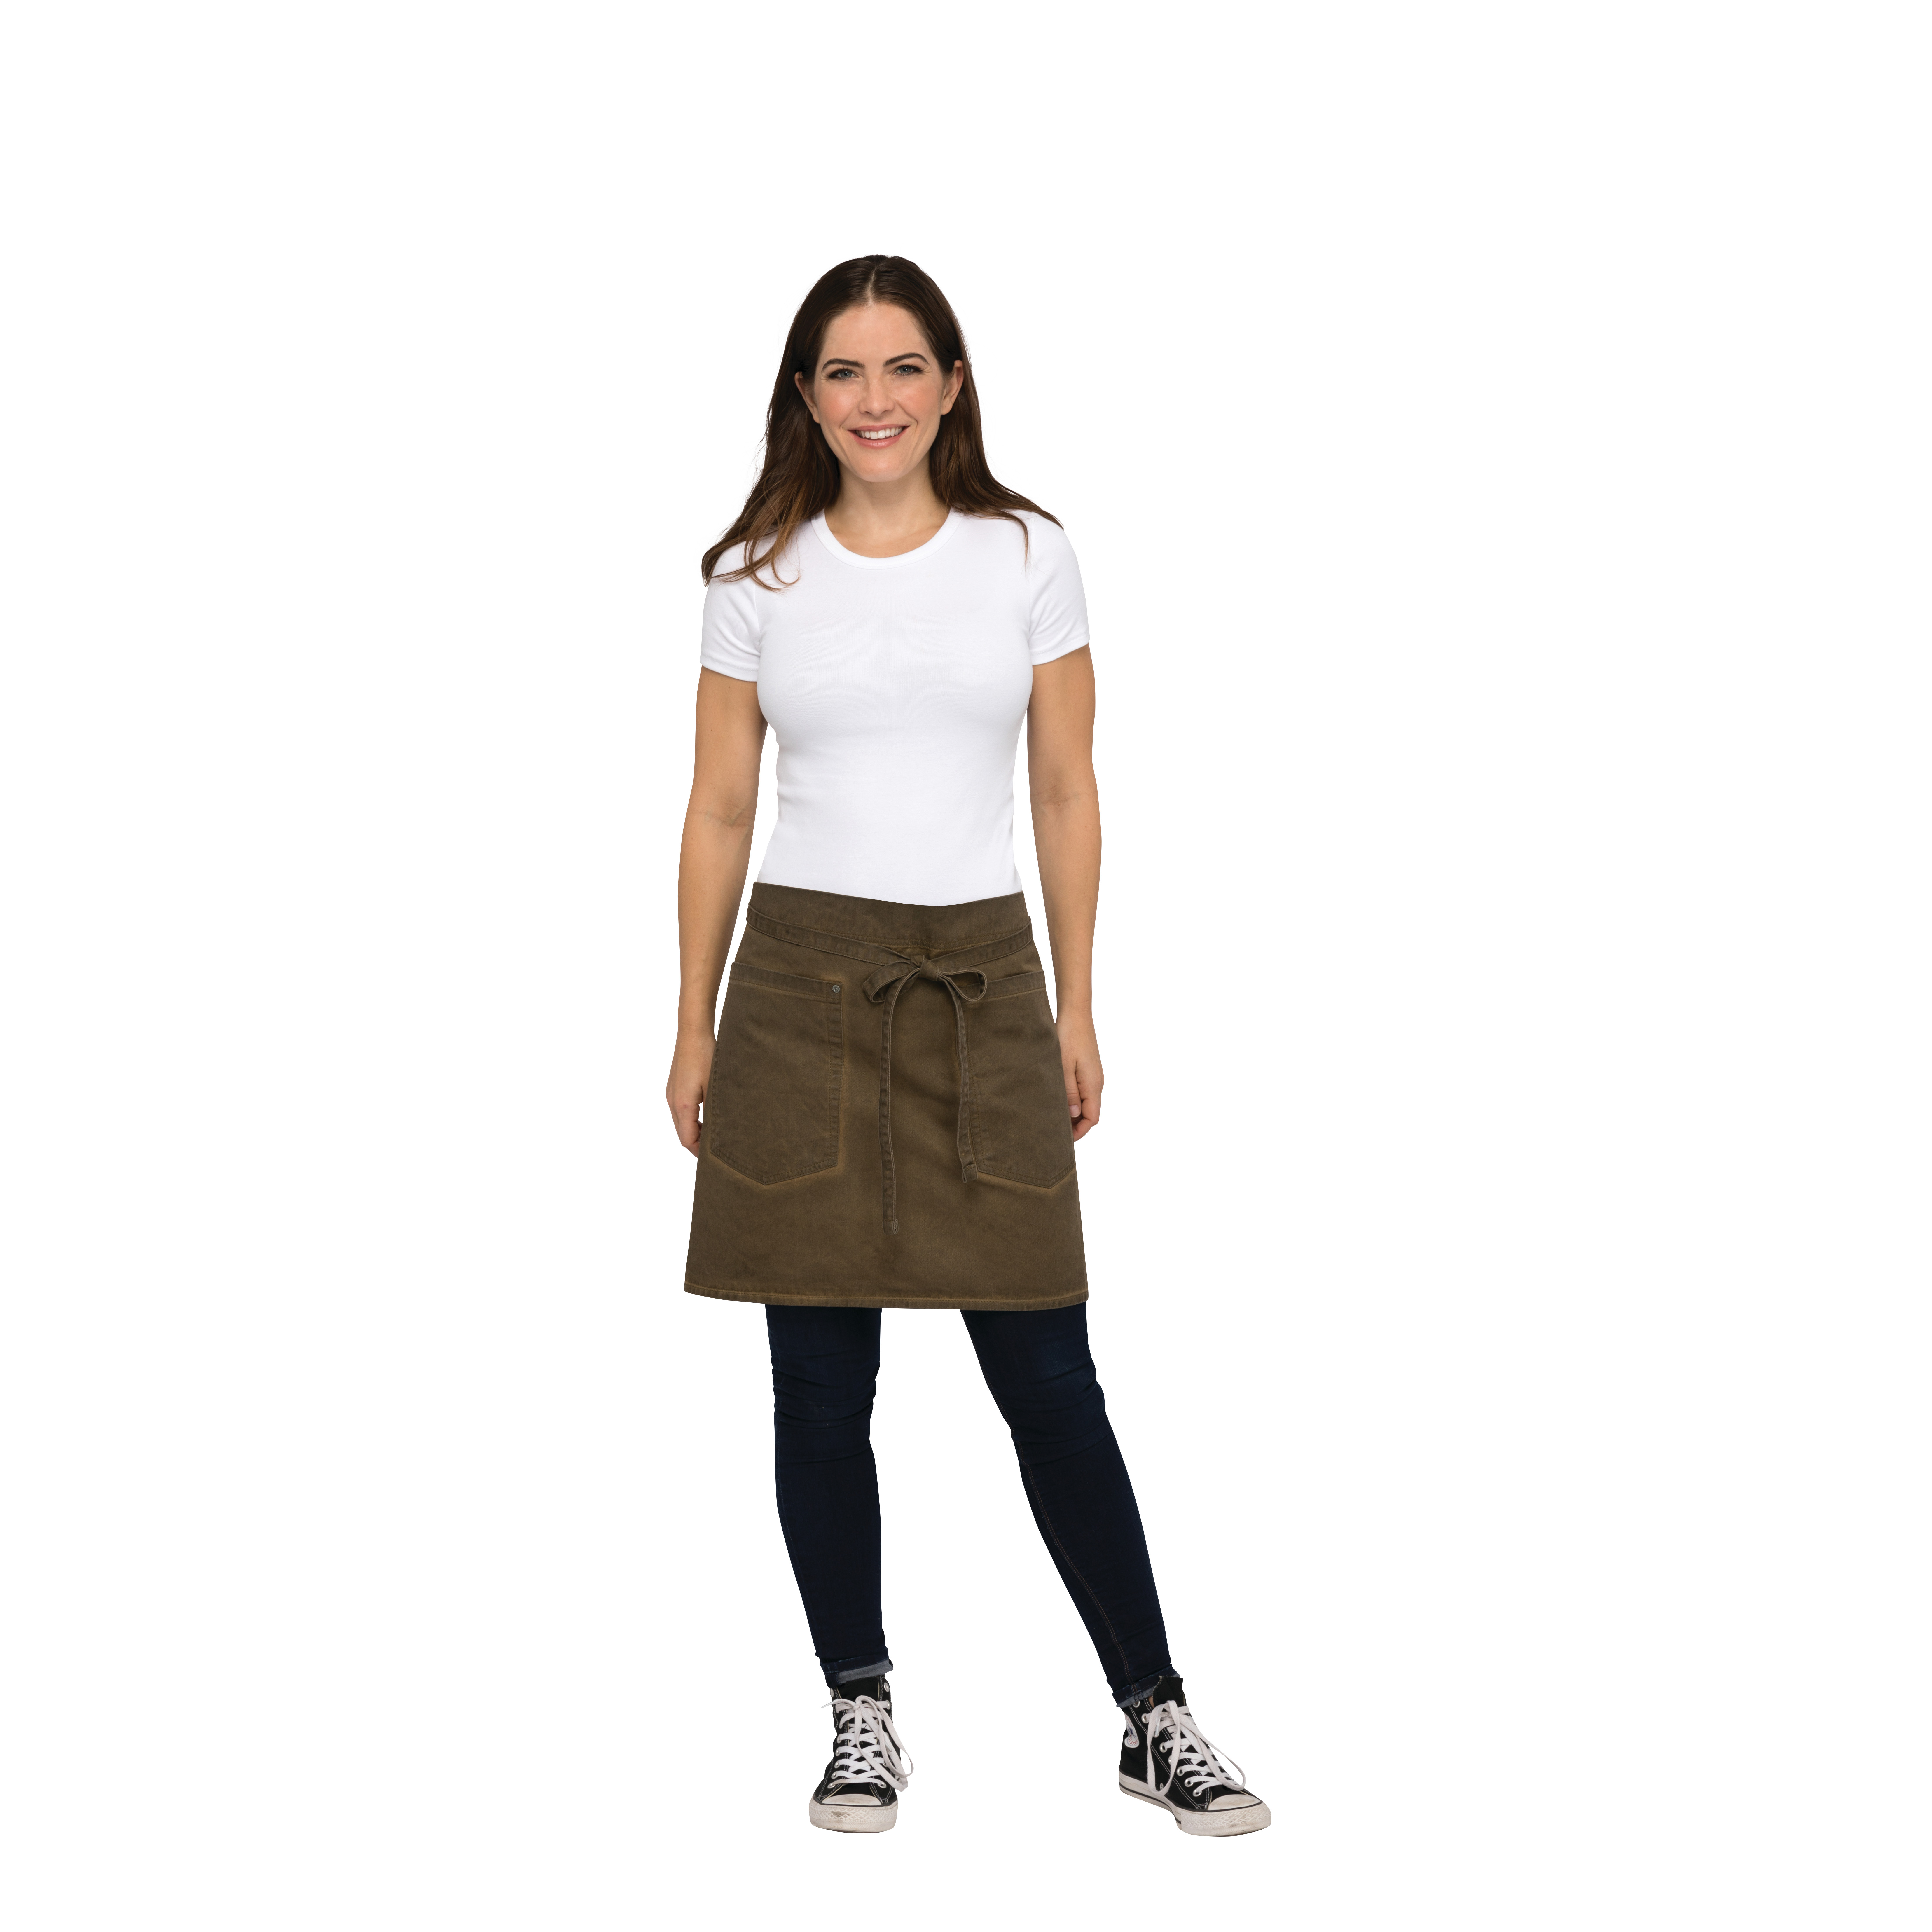 Chef Works AHWAQ014GBN0 waist apron